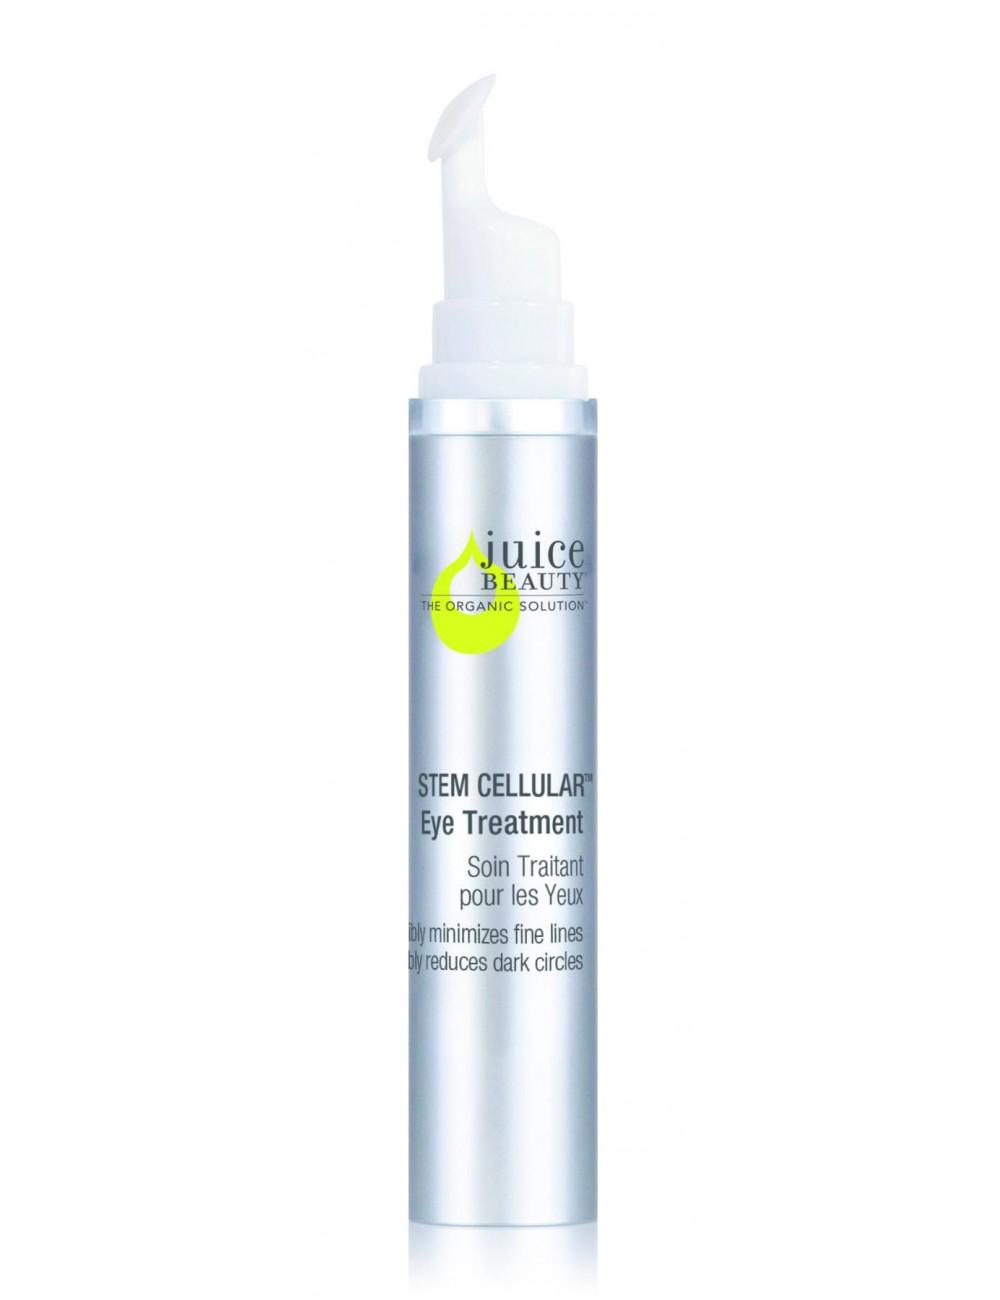 Juice Beauty Stem Cellular™ Anti-Wrinkle Eye Treatment 15ml